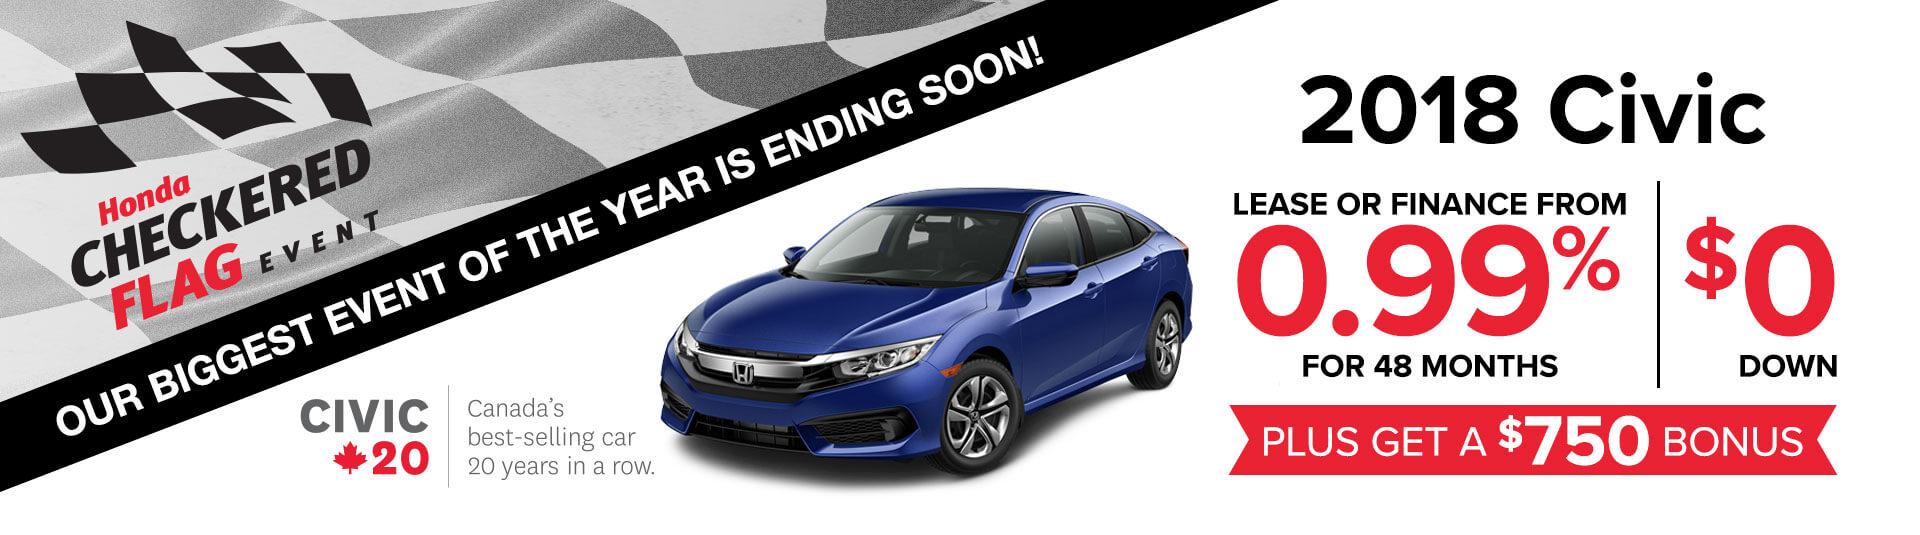 Honda Civic Checkered Flag Event